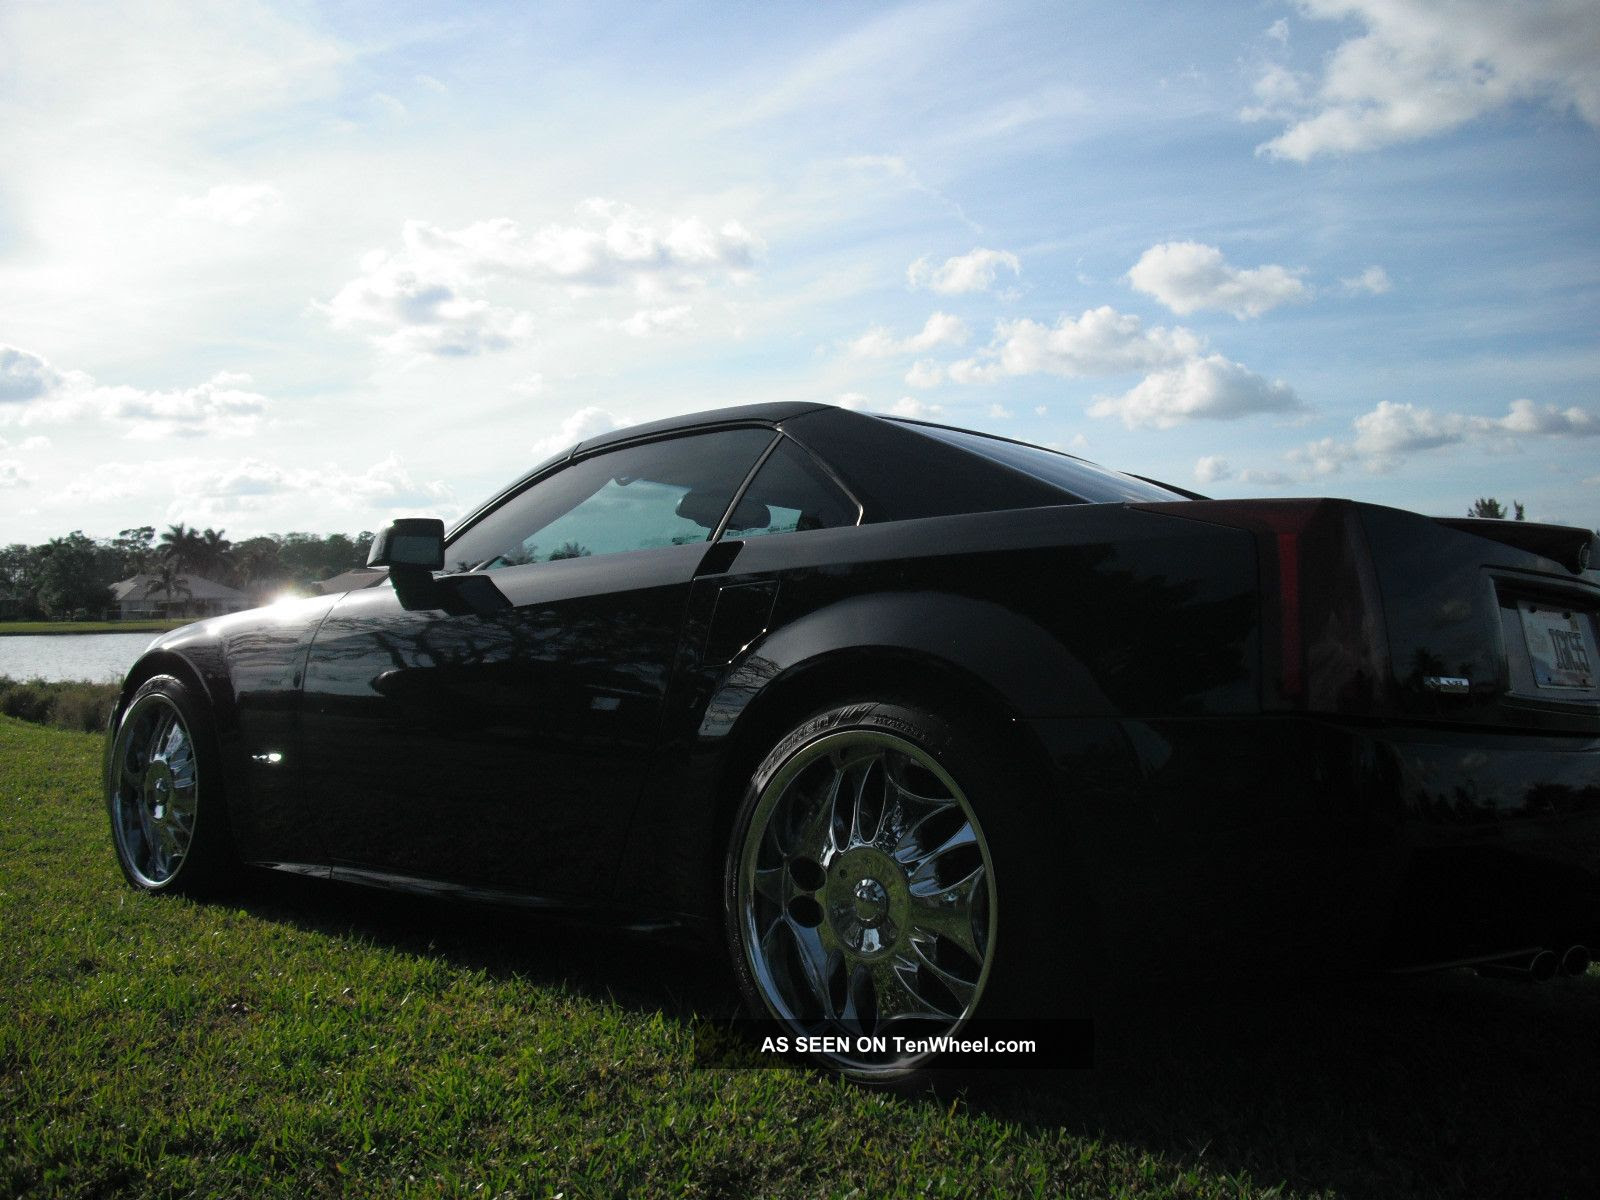 2004 Cadillac Xlr Luxury Vehicle With Sportscar Perfomance